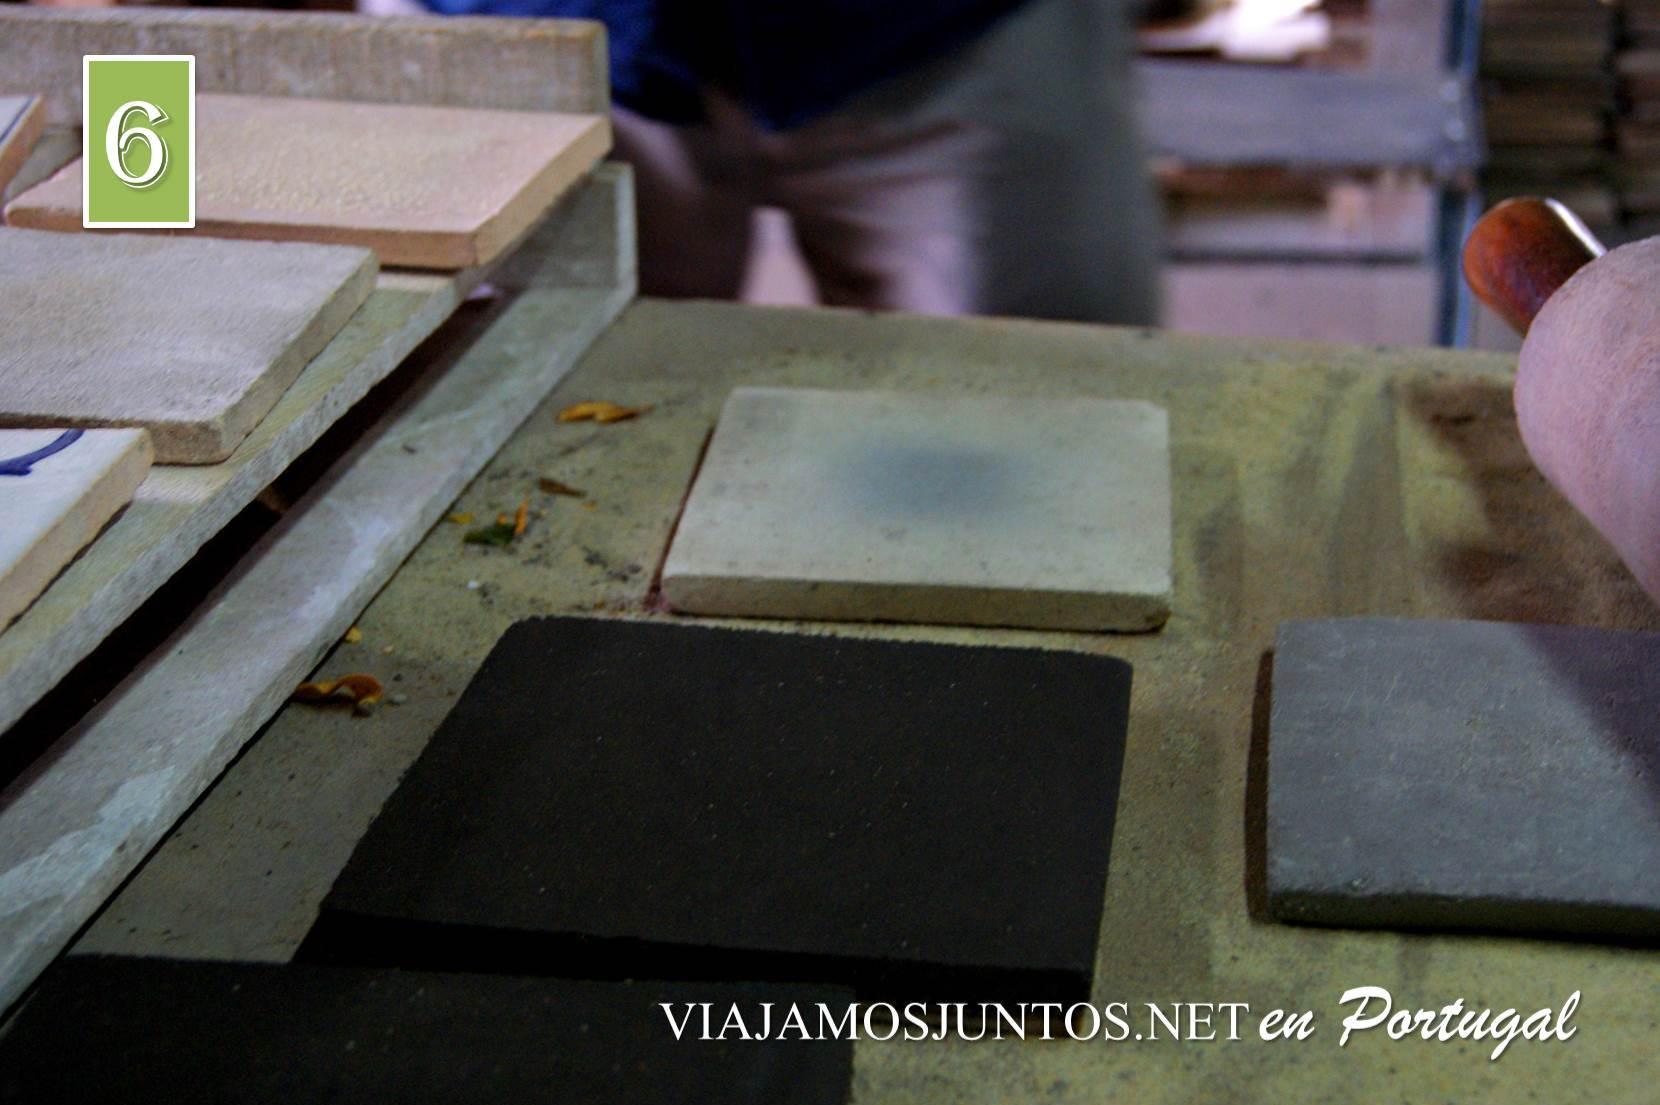 Taller de los azulejos de Azeitao, Setúbal, Portugal